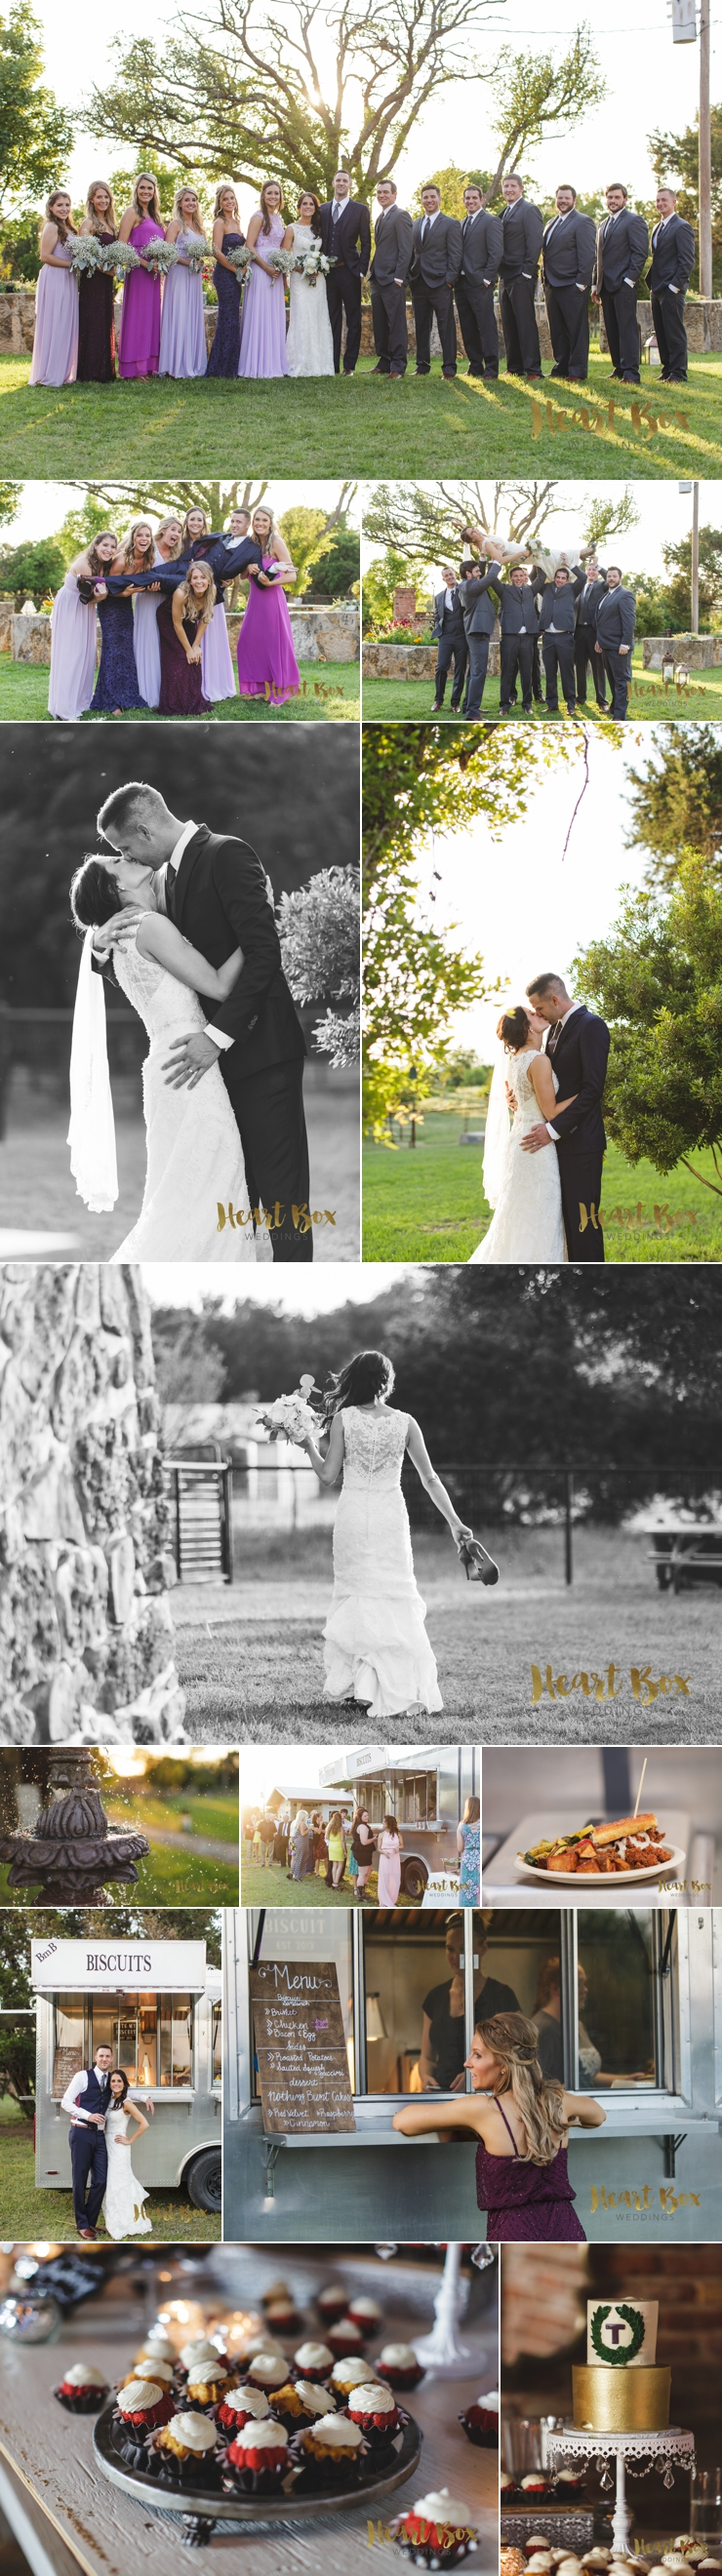 Thomas Wedding Blog Collages 7.jpg